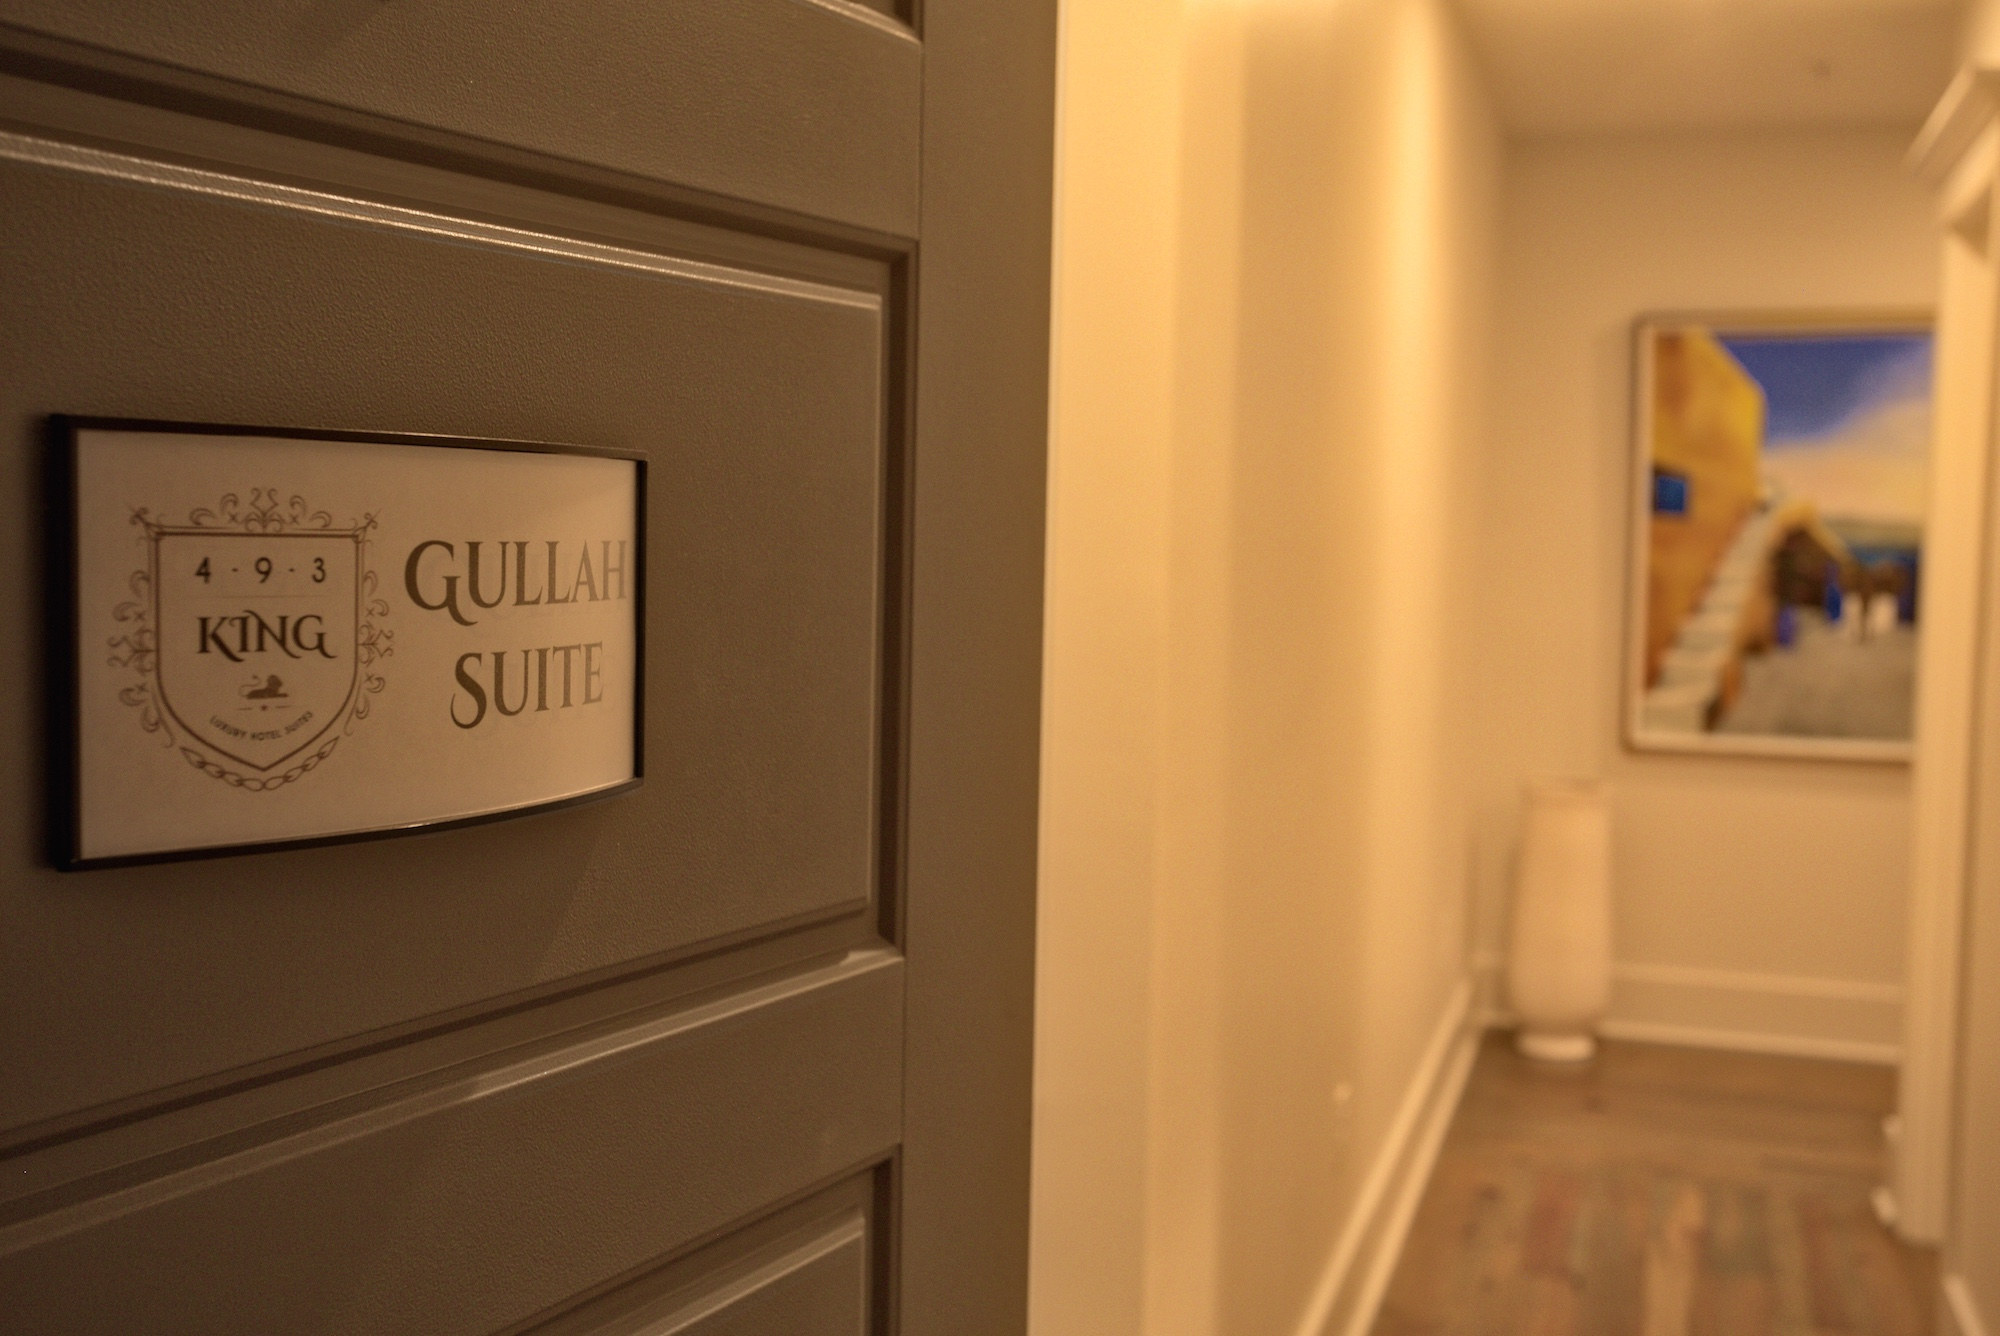 Suite on King Street Charleston SC Vacation Rental The Gullah Suite6.jpeg